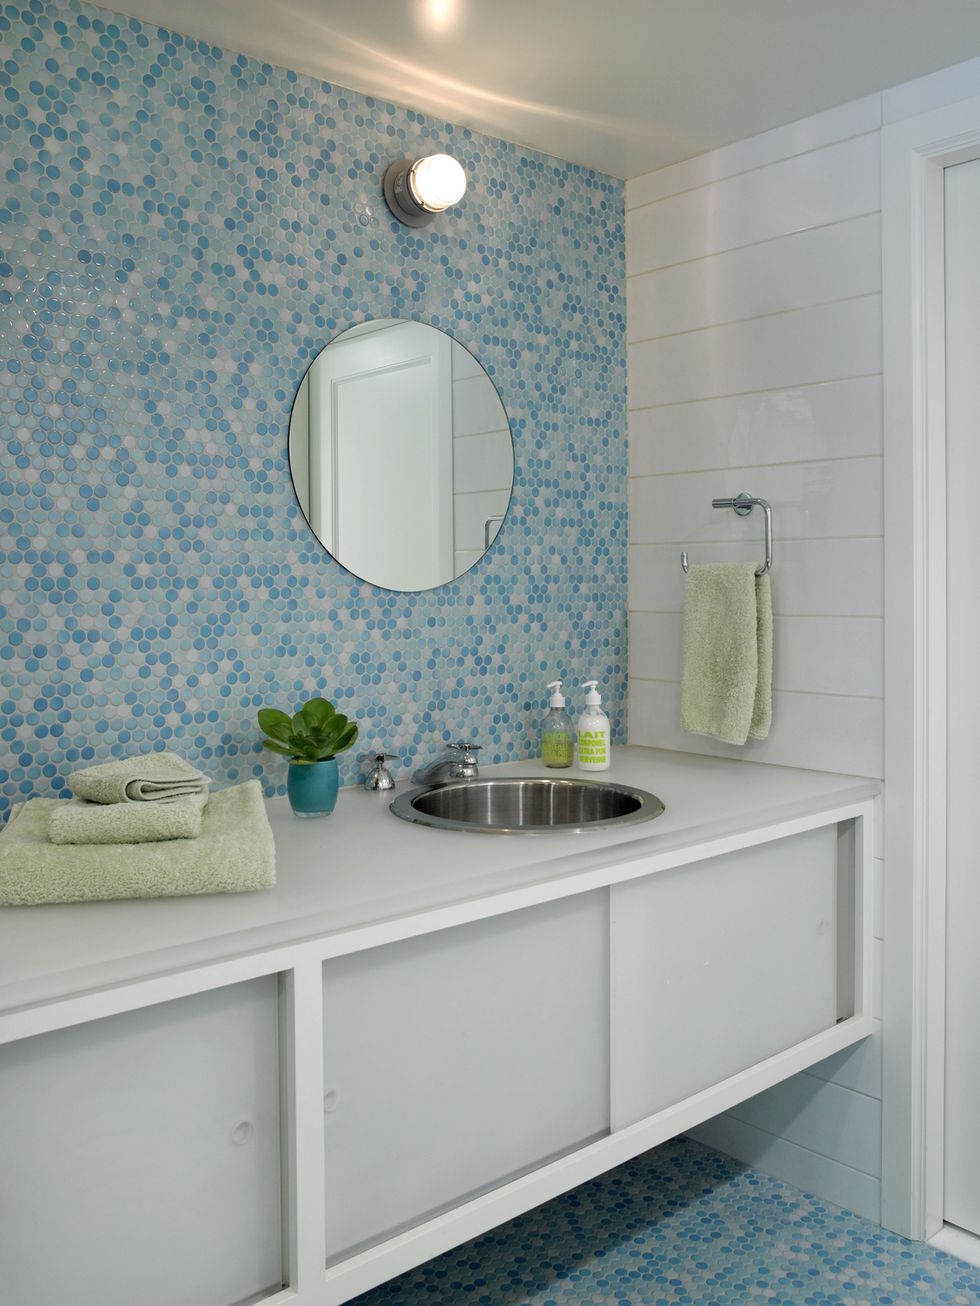 10 Beautiful Tile Ideas For A Bold Bathroom Interior ...